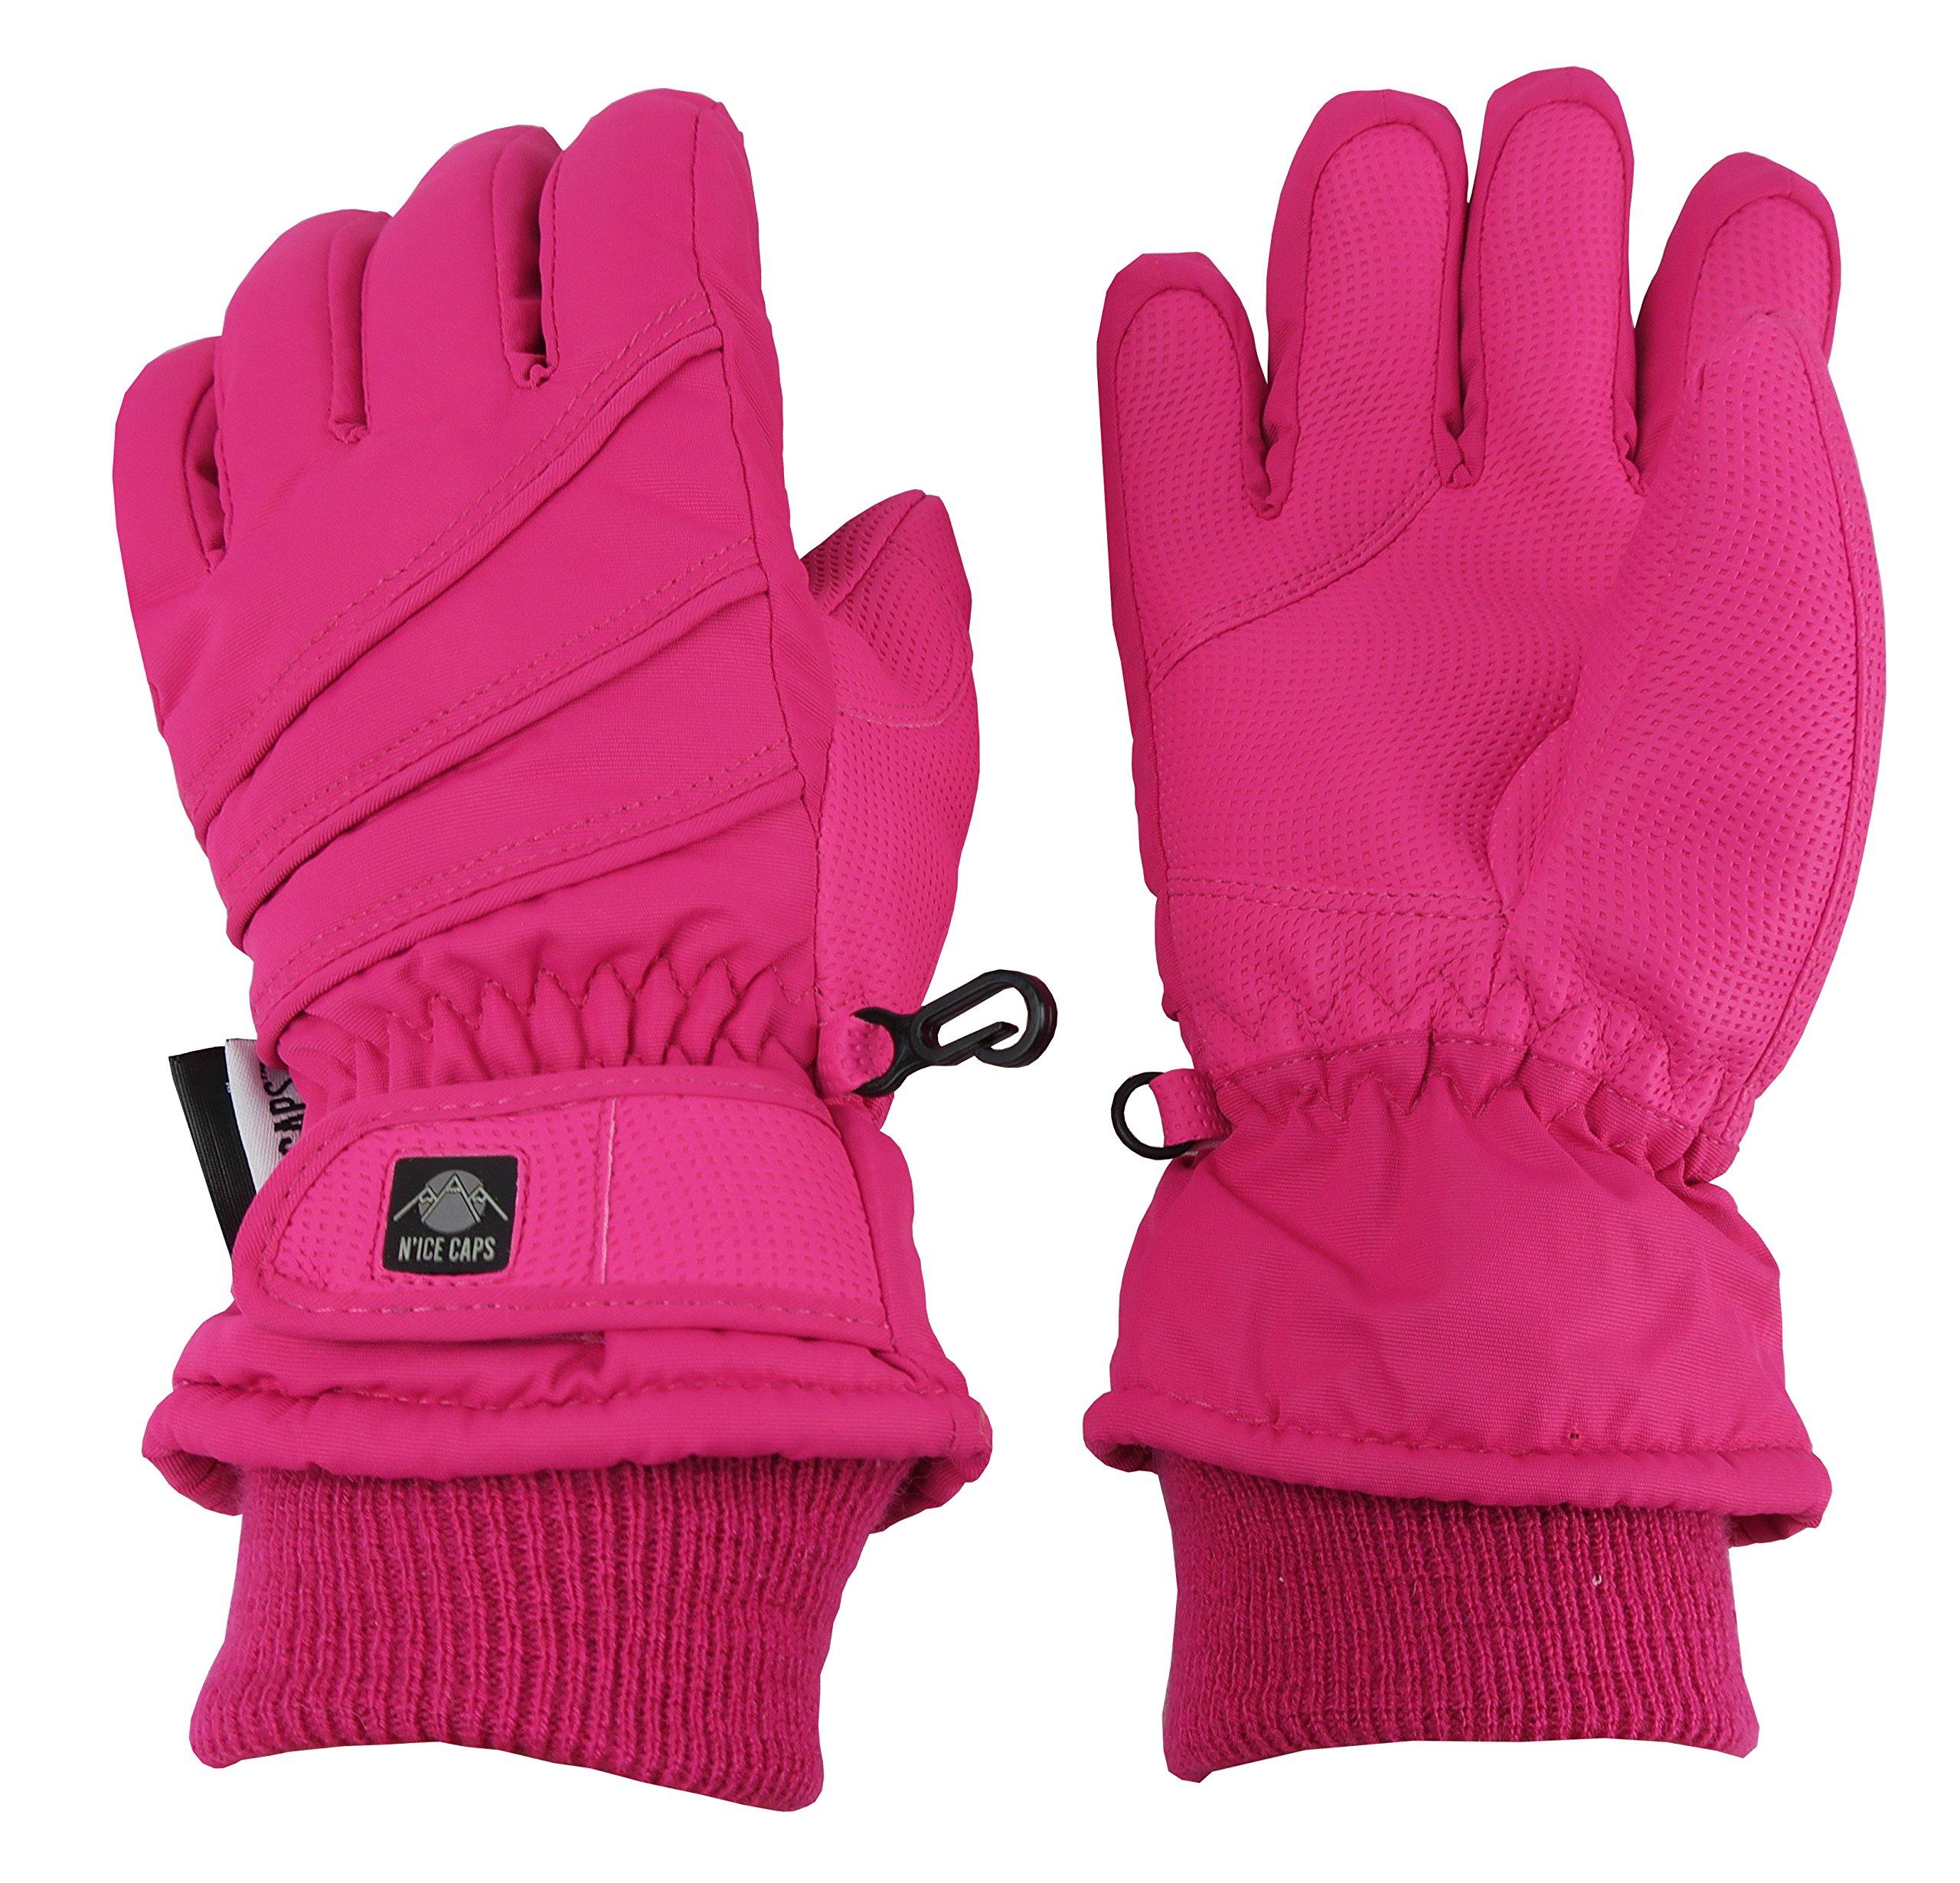 N'Ice Caps Kids Bulky Thinsulate Waterproof Winter Snow Ski Glove With Ridges (Fuchsia 1, 9-10yrs)